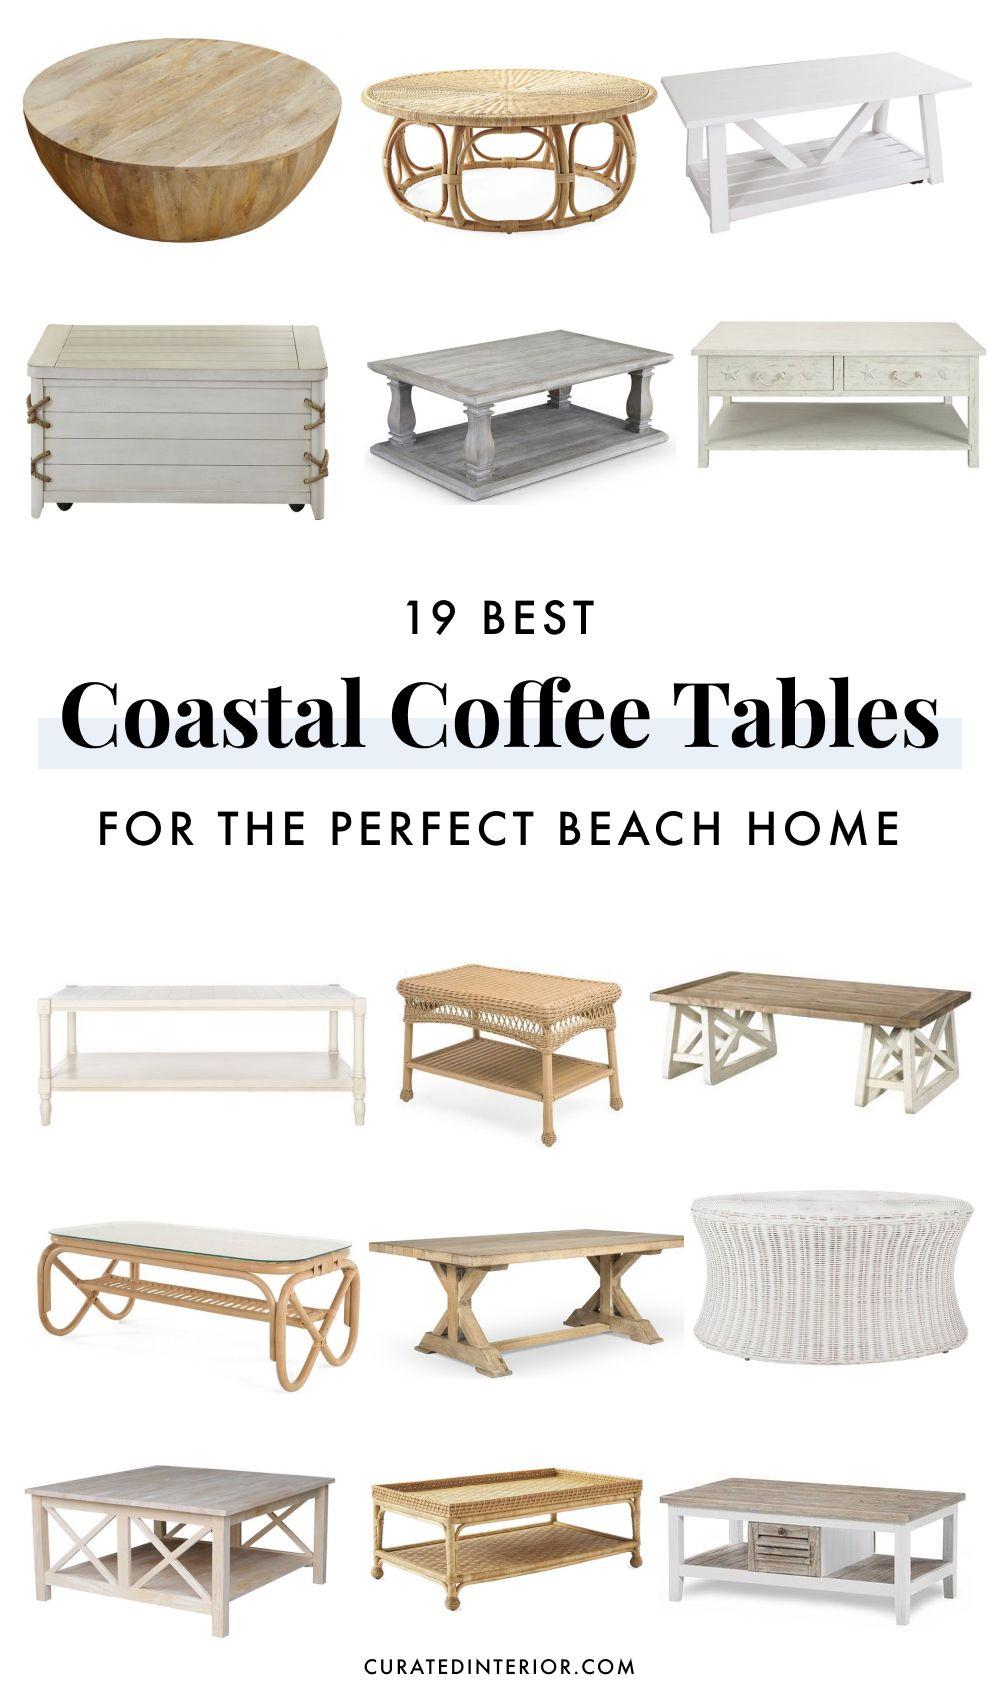 19 coastal coffee tables for your beach